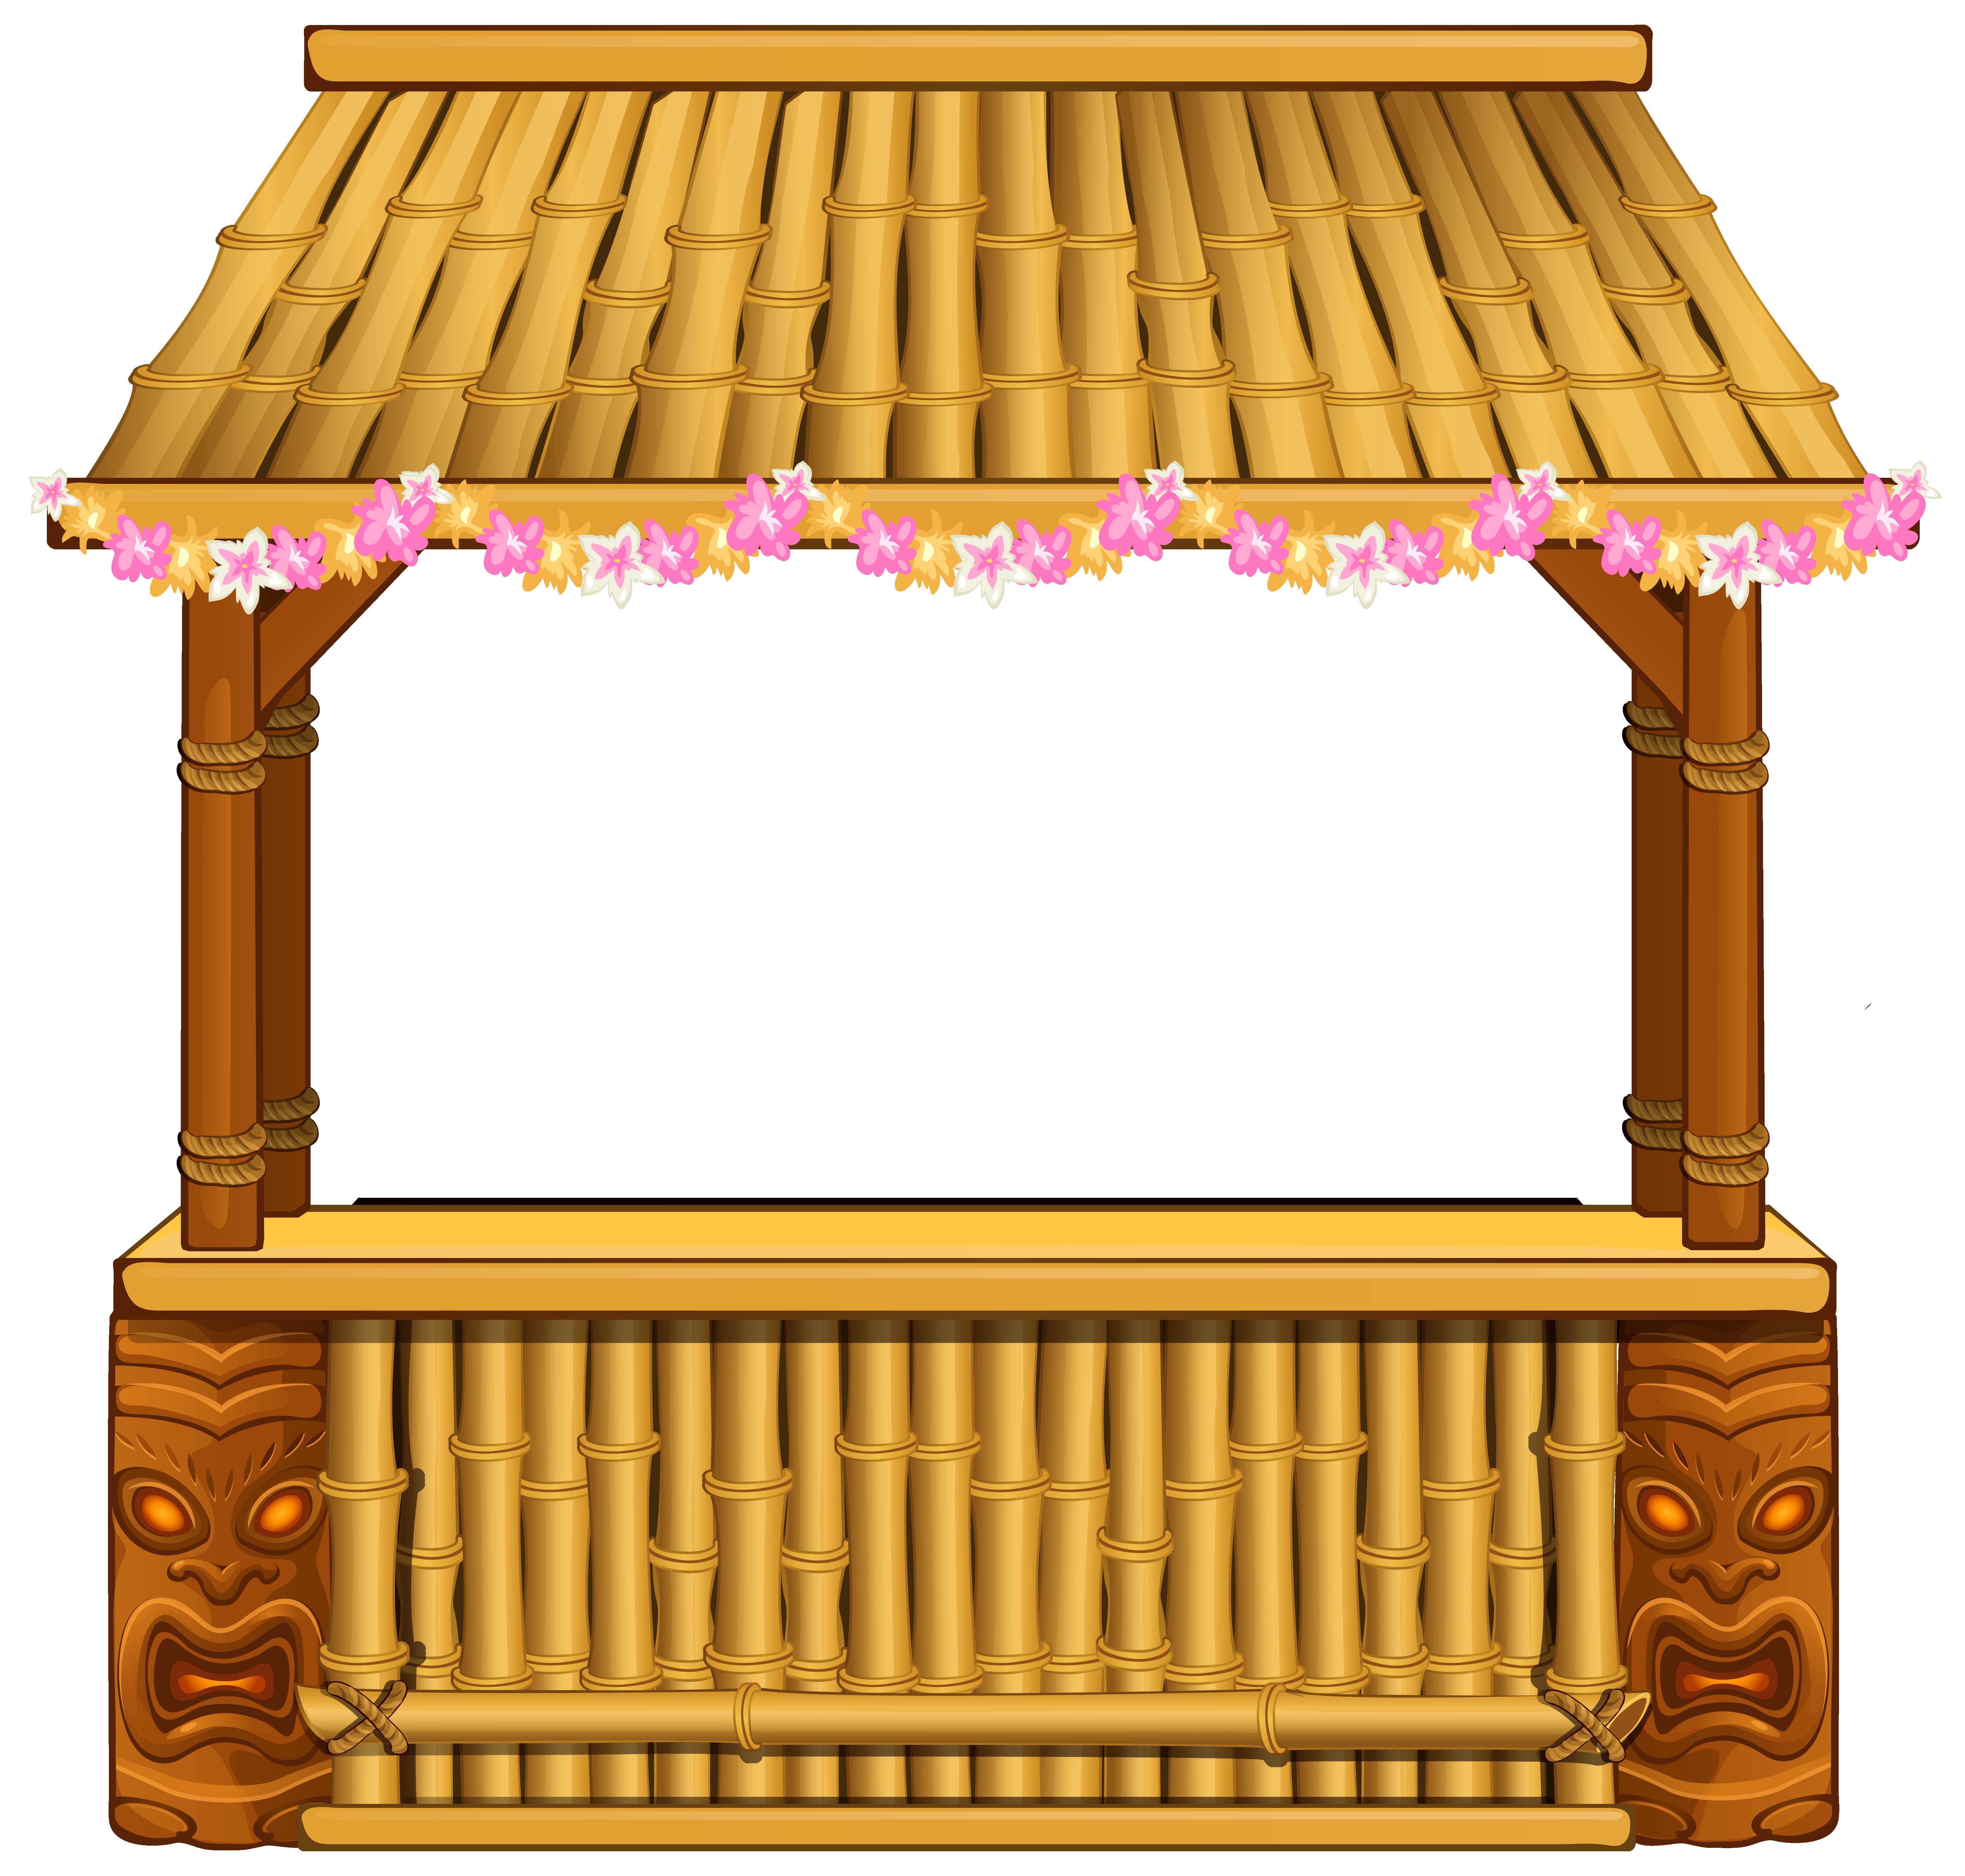 Tiki Bar PNG Clipart Image.